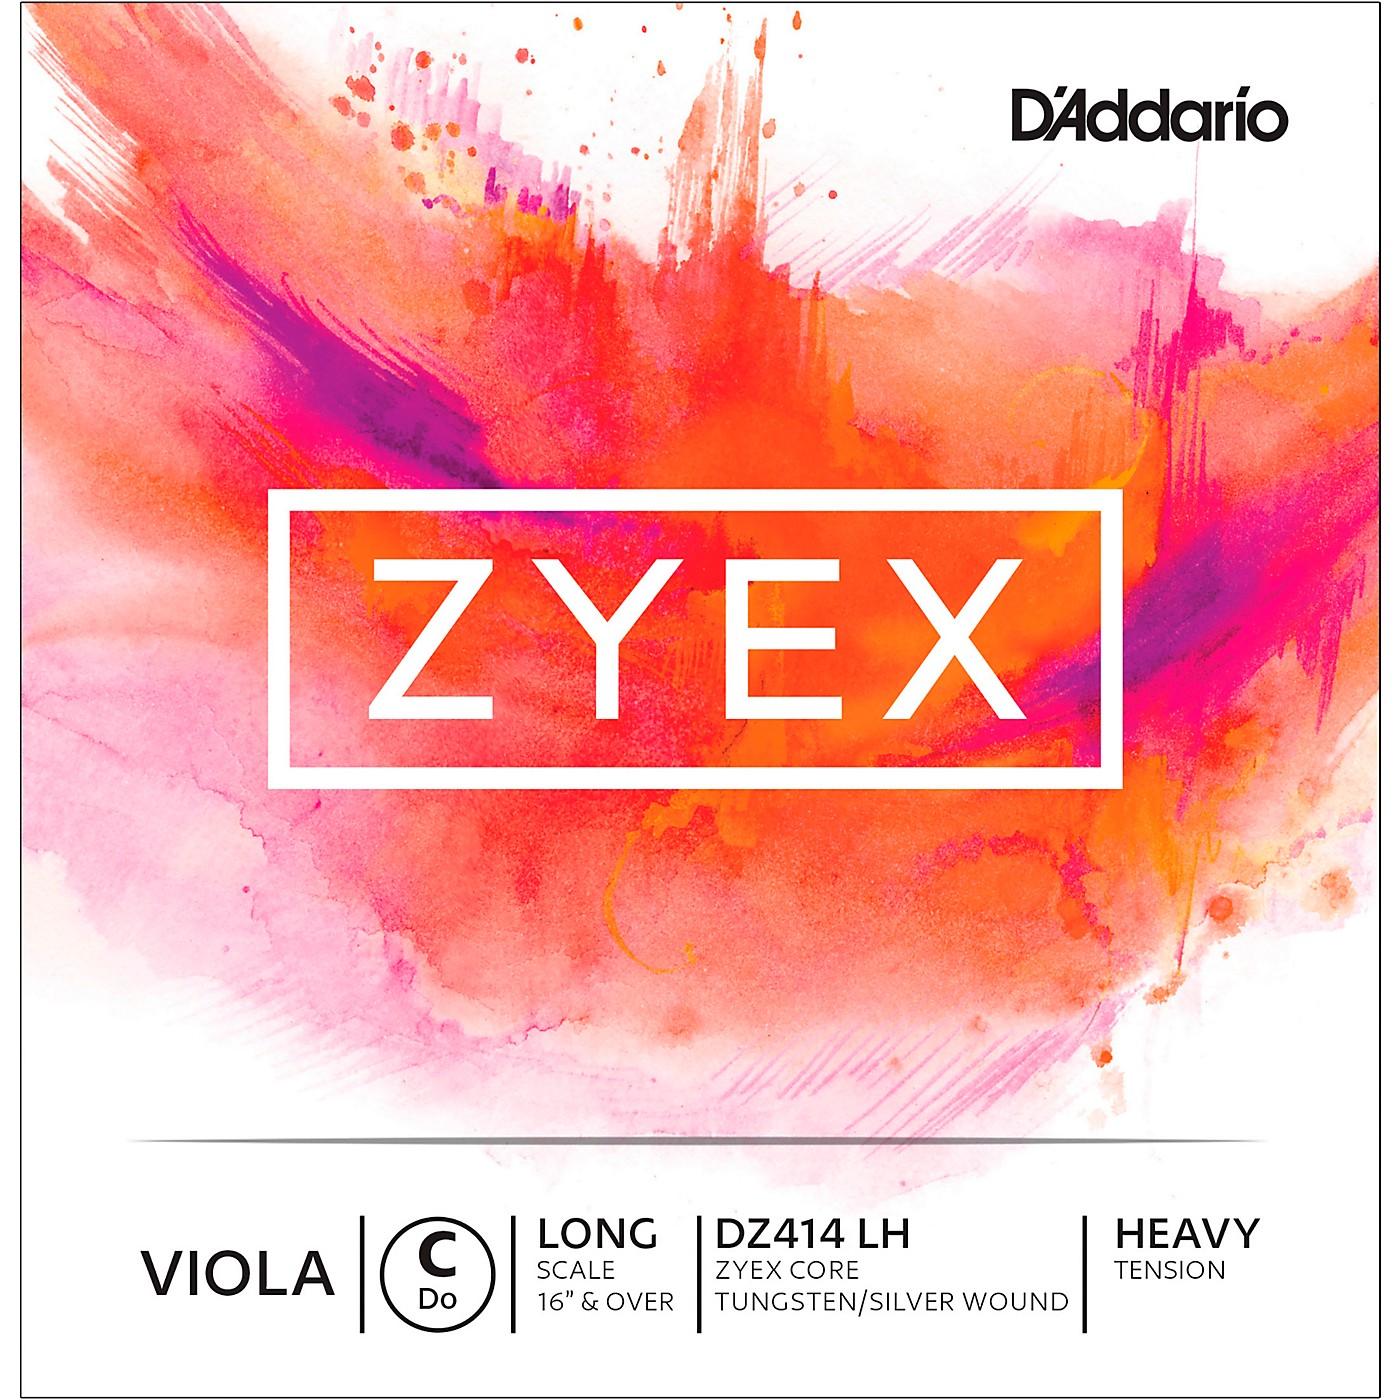 D'Addario Zyex Series Viola C String thumbnail